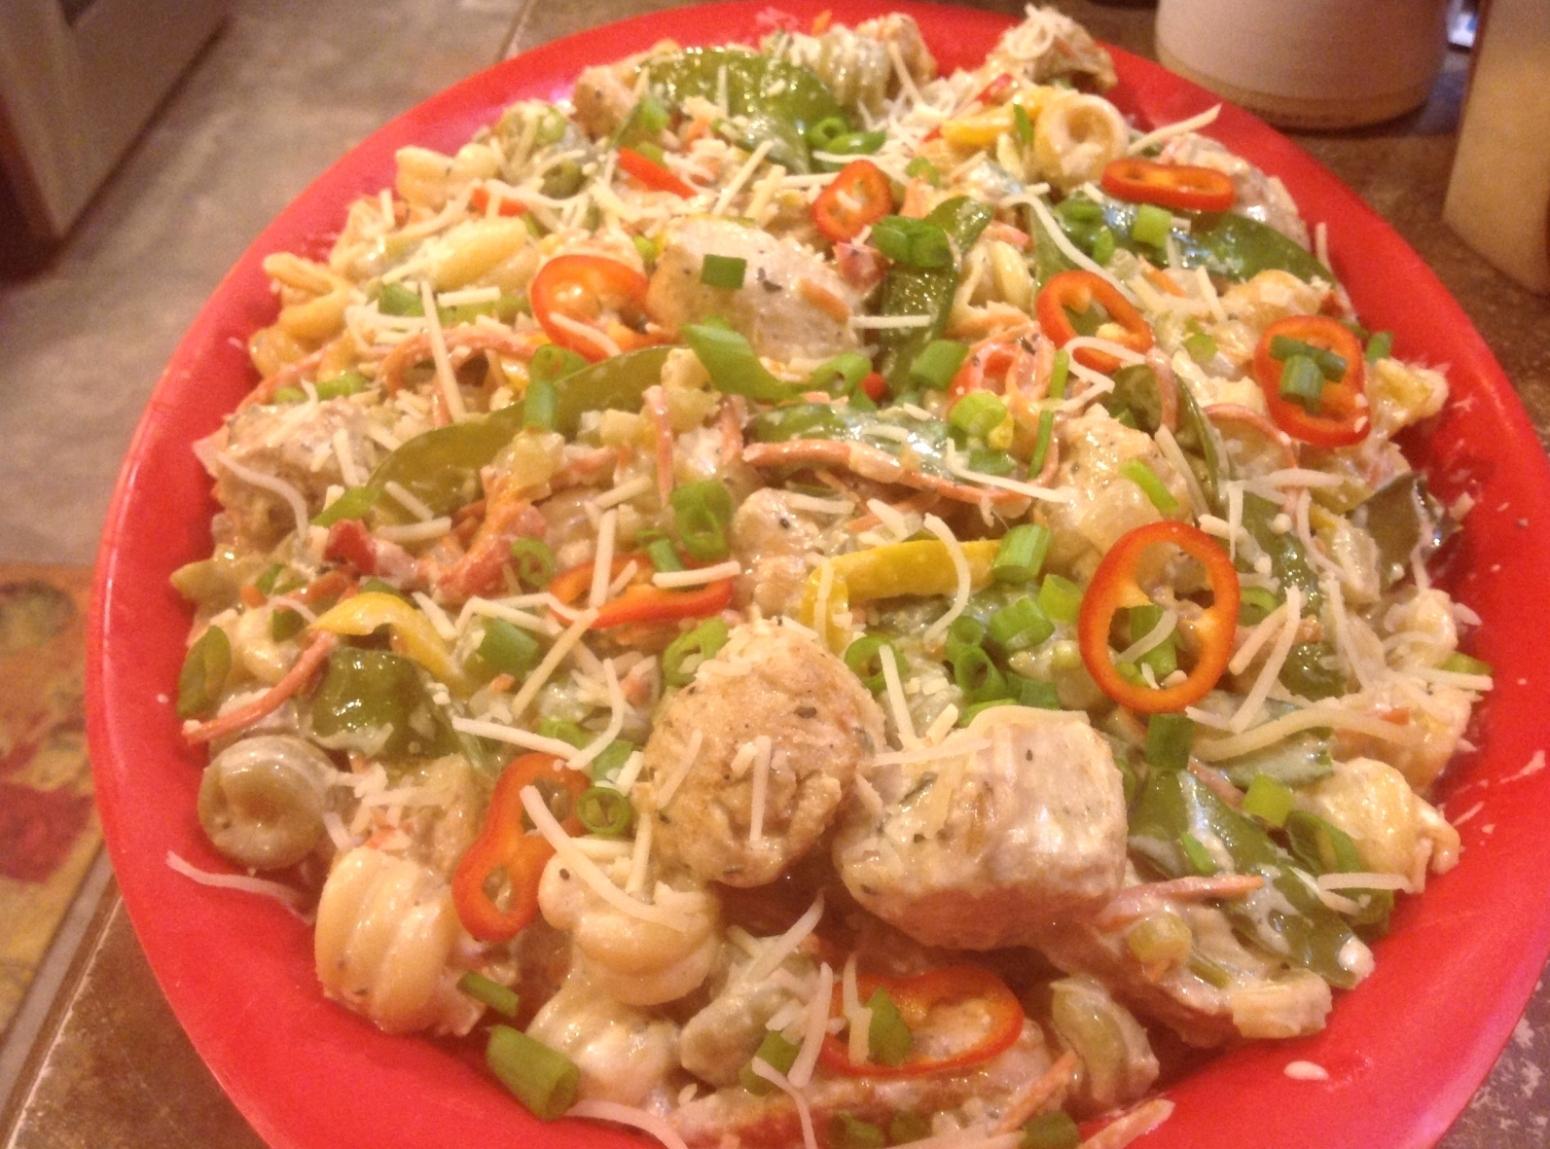 Low fat pasta dish